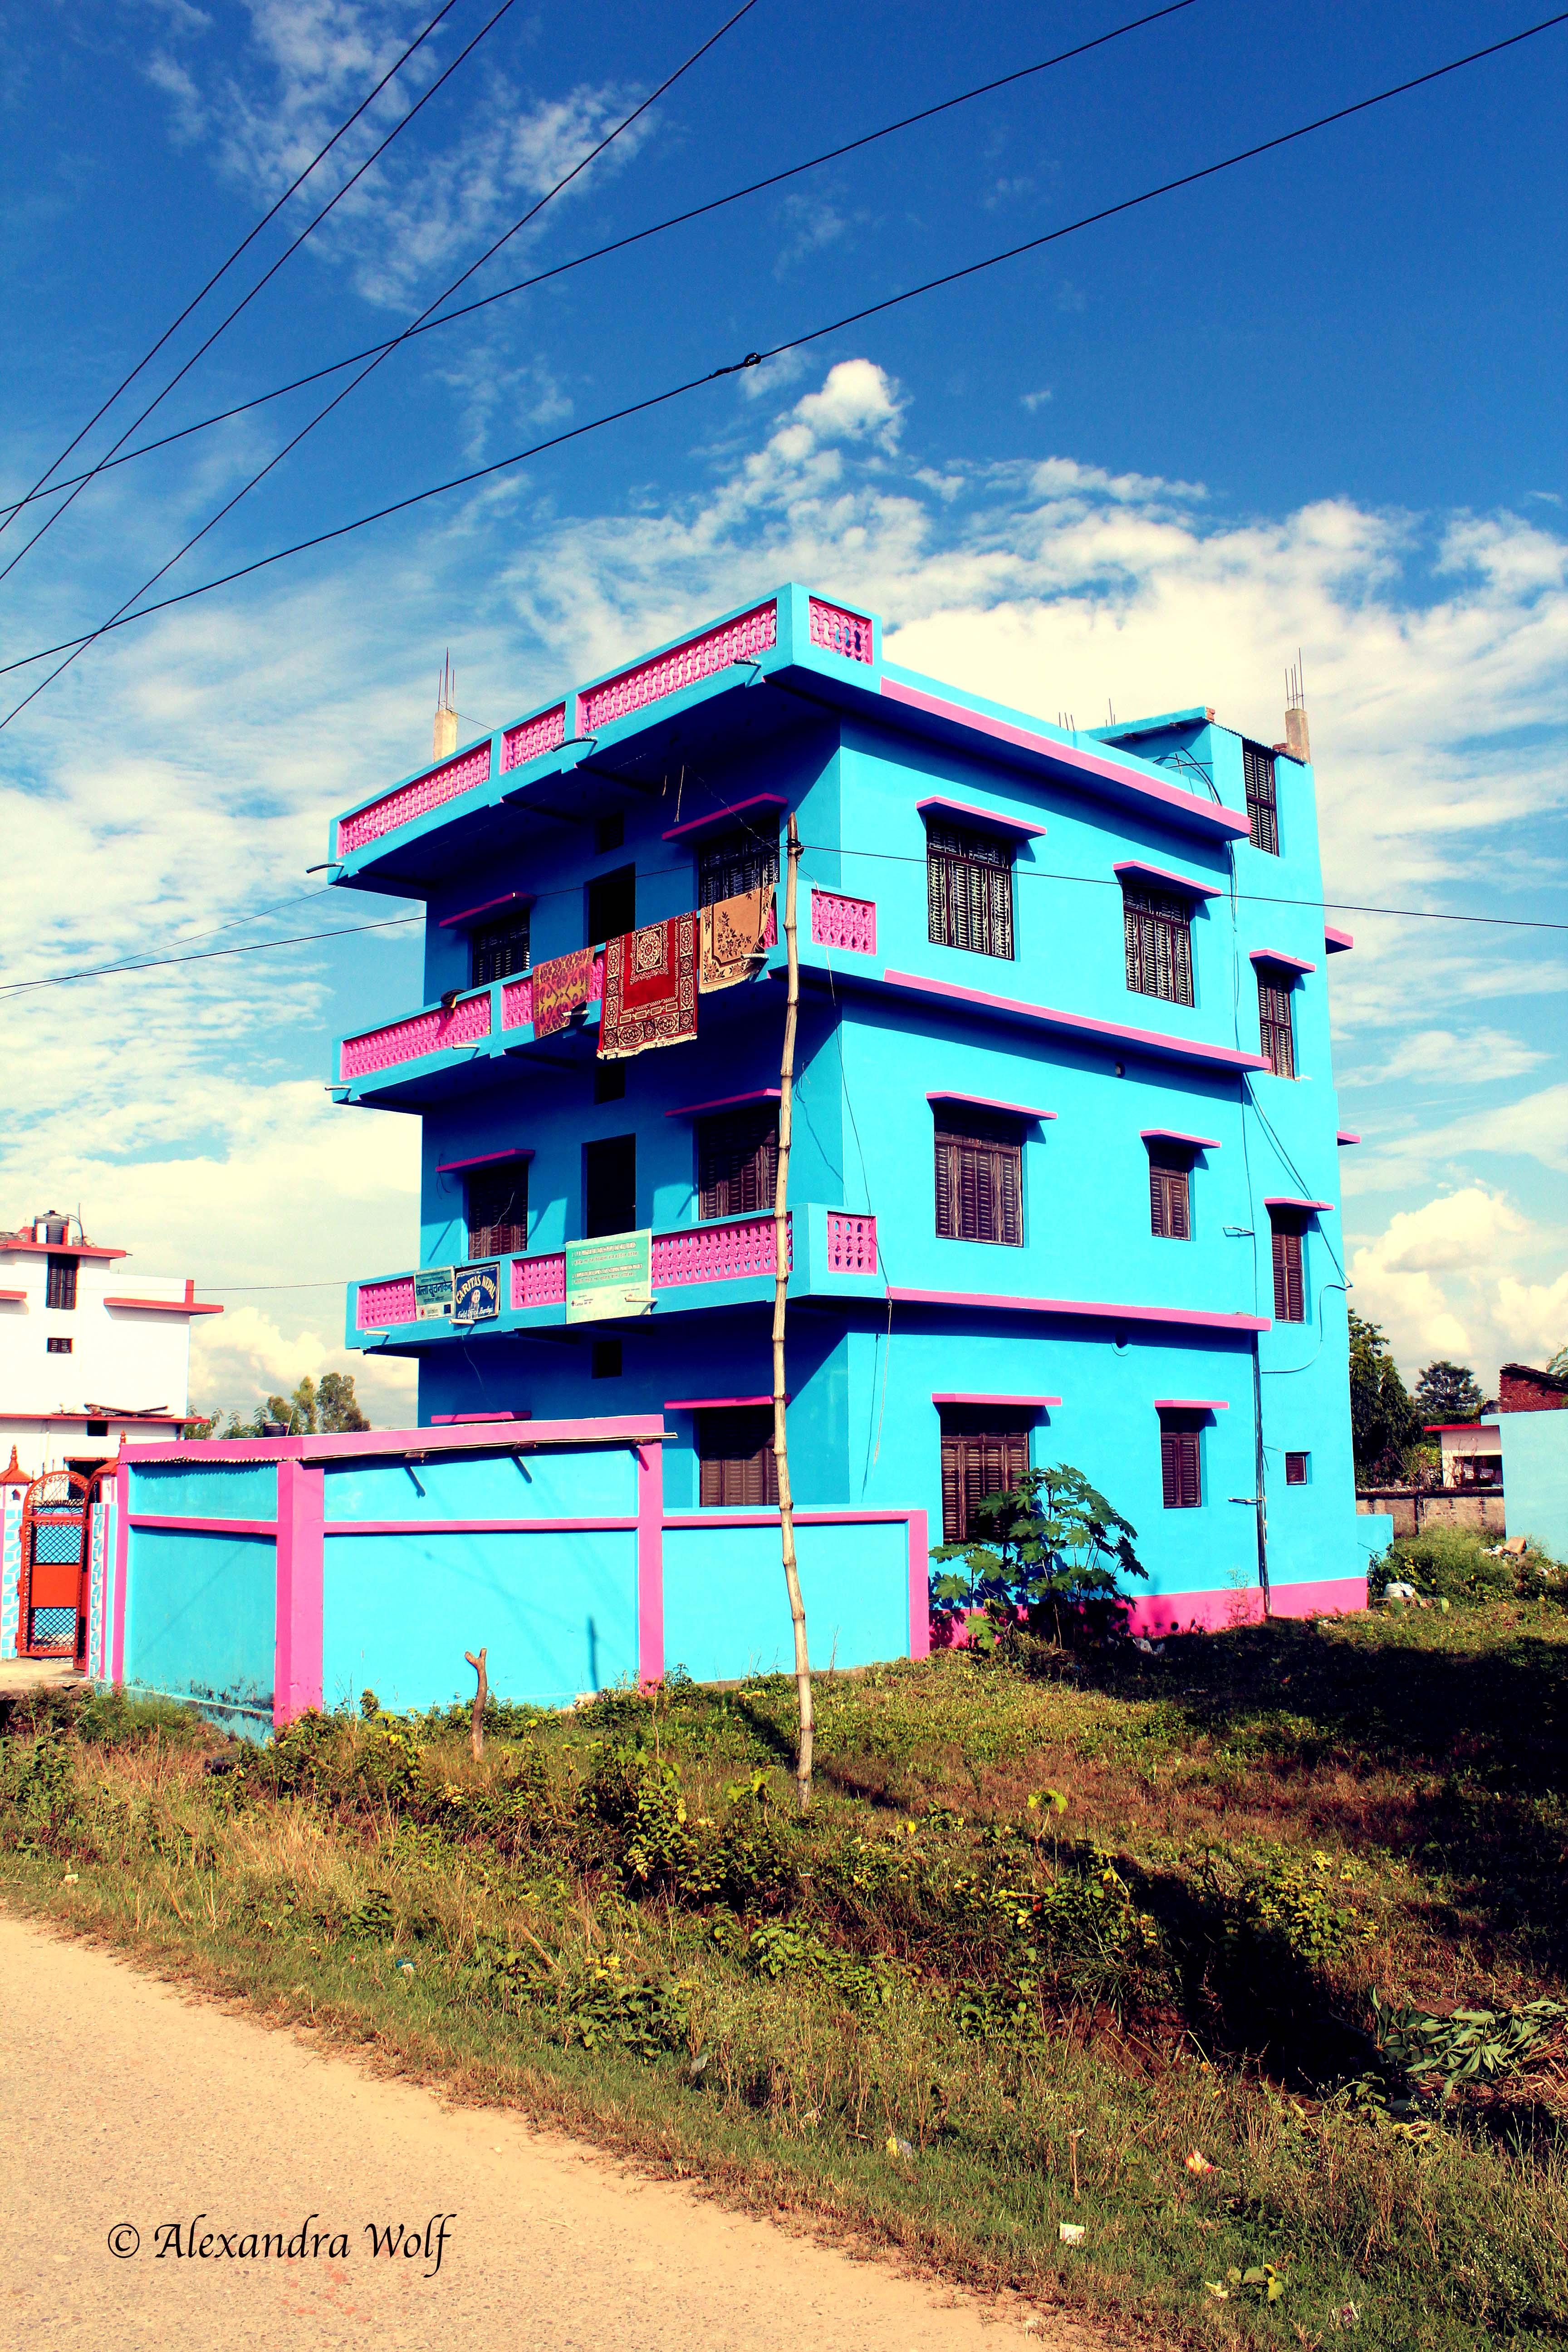 Visuelle Kommunikation & Social Media Nepal 2013 Alexandra Wolf